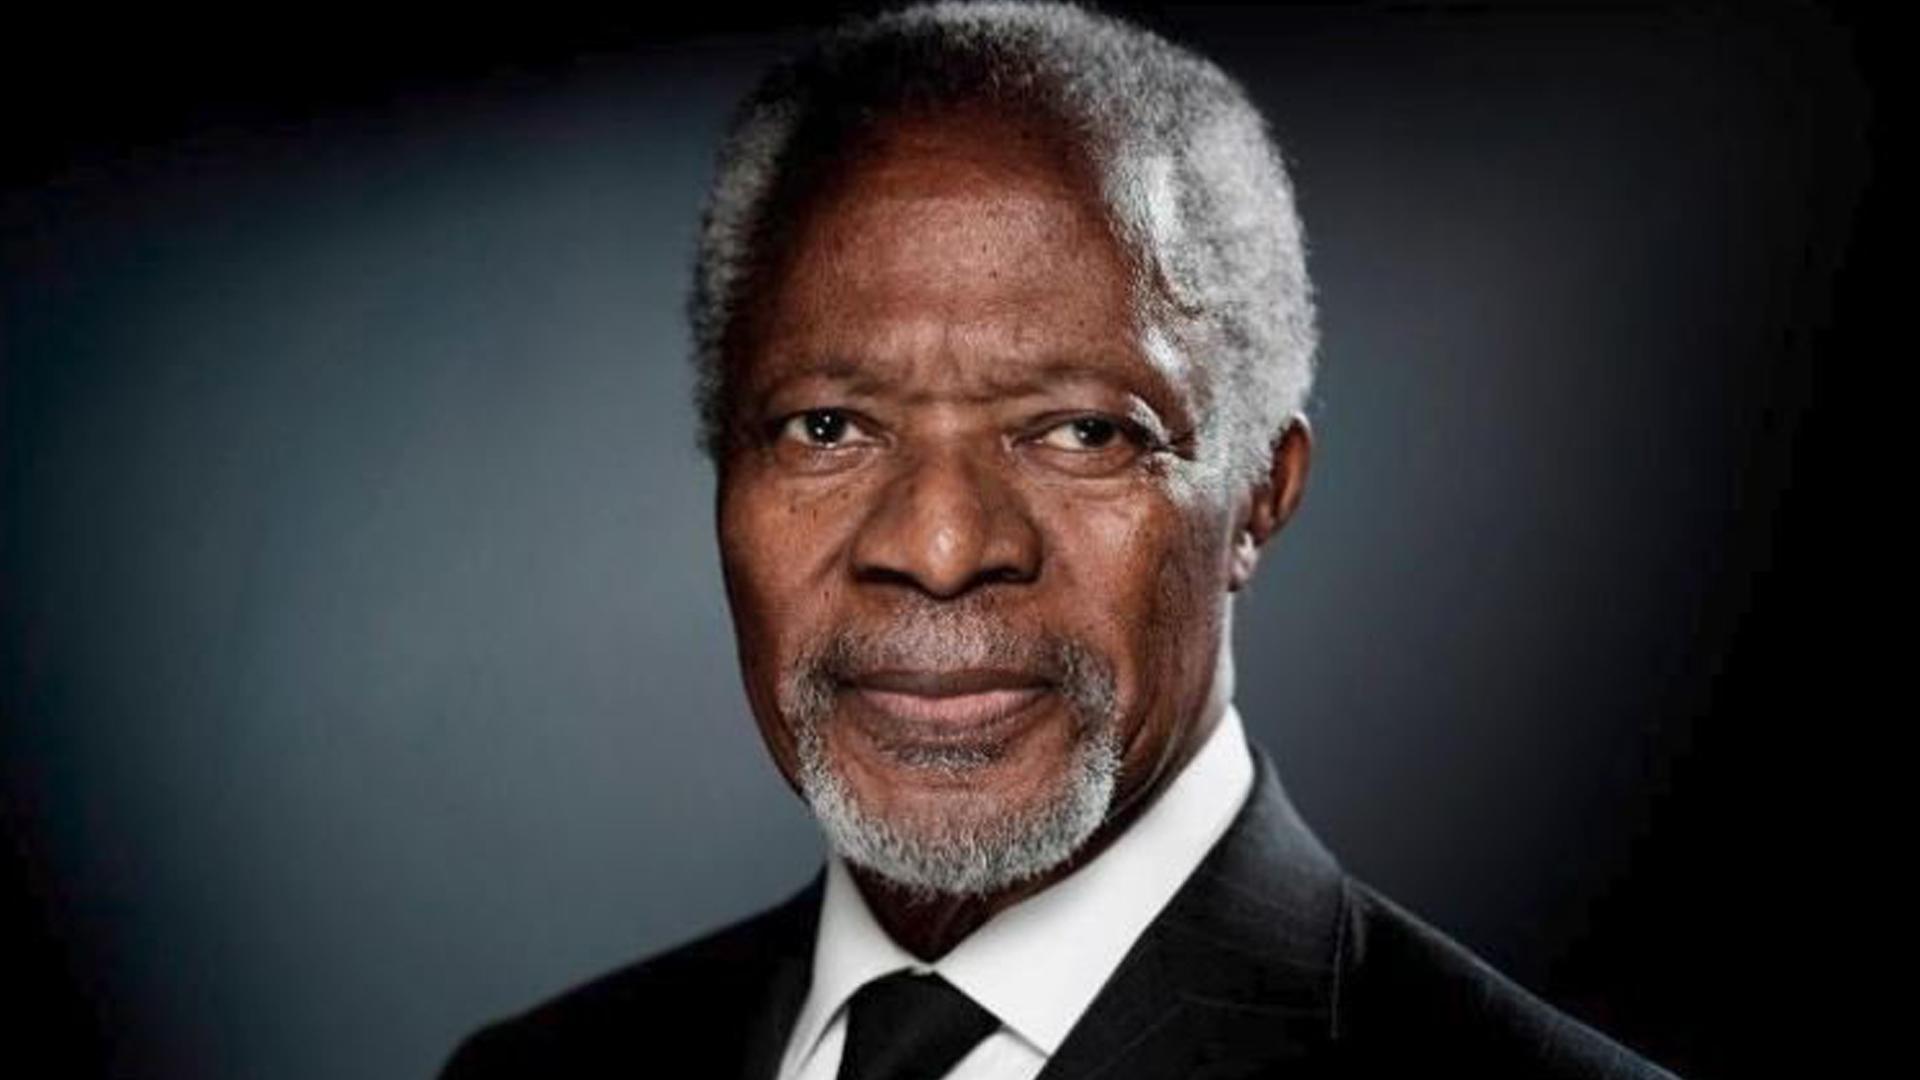 Former U.N. Secretary-General Kofi Annan is seen in an undated photo. (Credit: AFP/Getty Images)